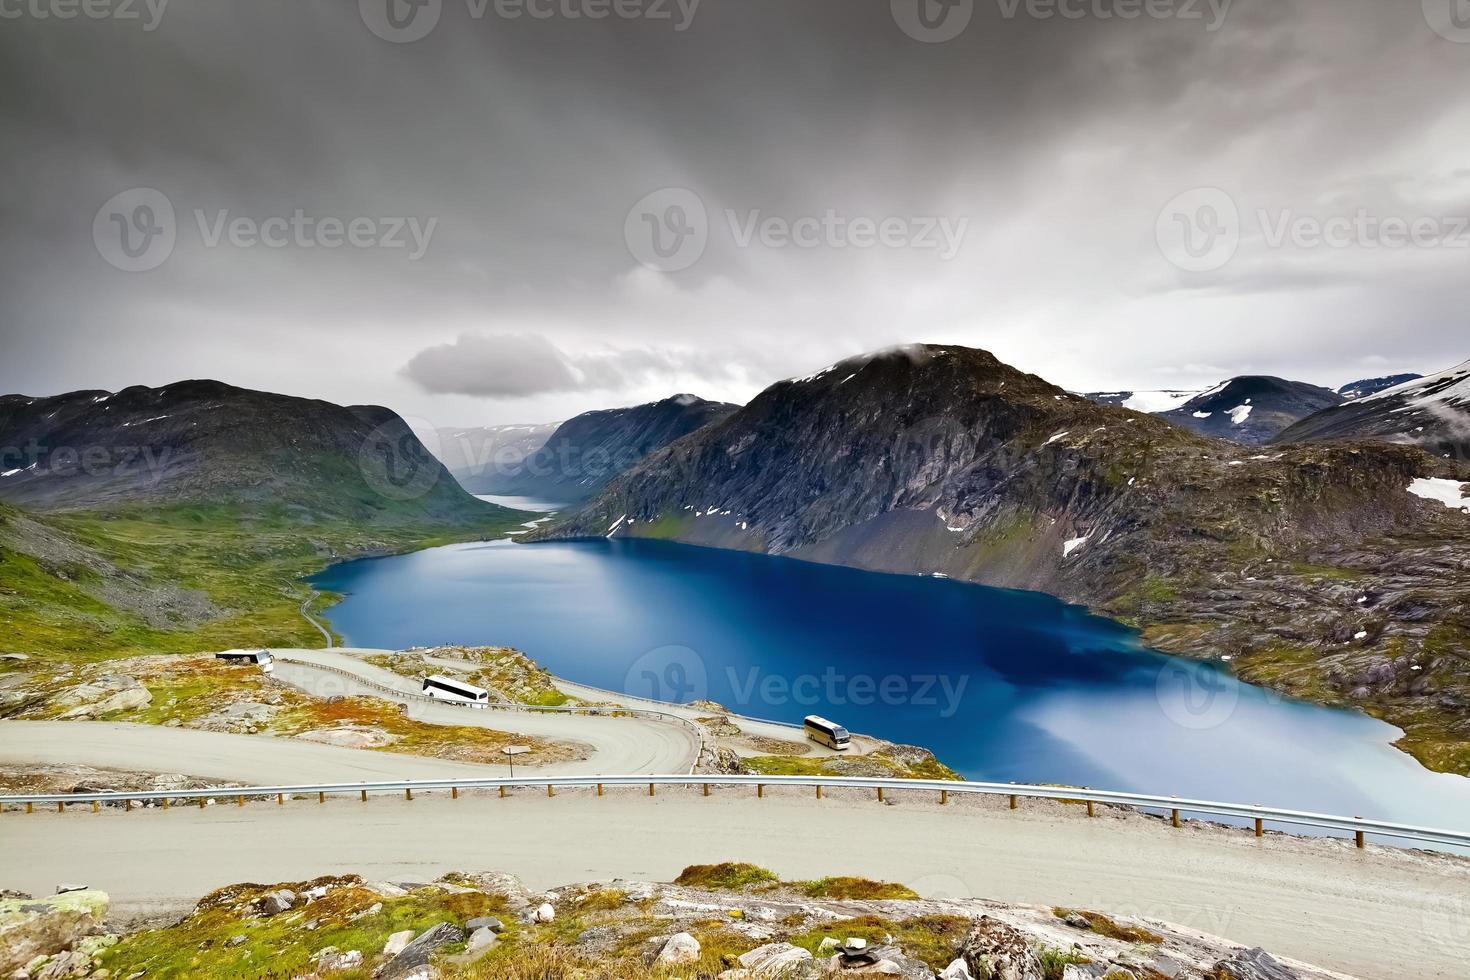 lago djupvatnet vicino a geirangerfjord, dalsnibba - norvegia - scandinavia foto